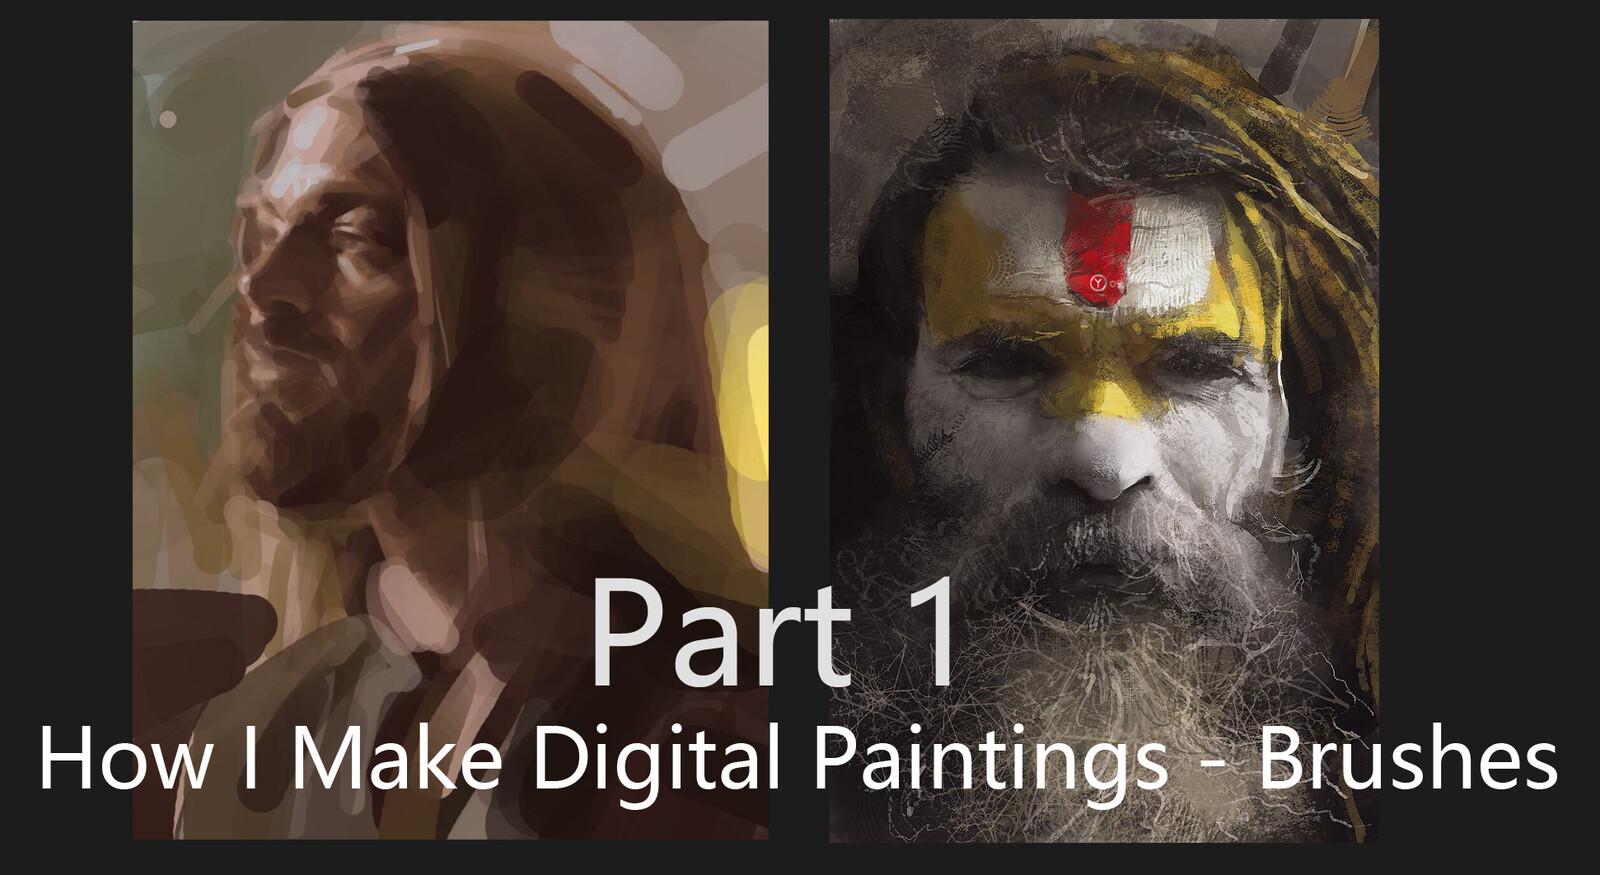 How I Make Digital Paintings | Brushes - part 1